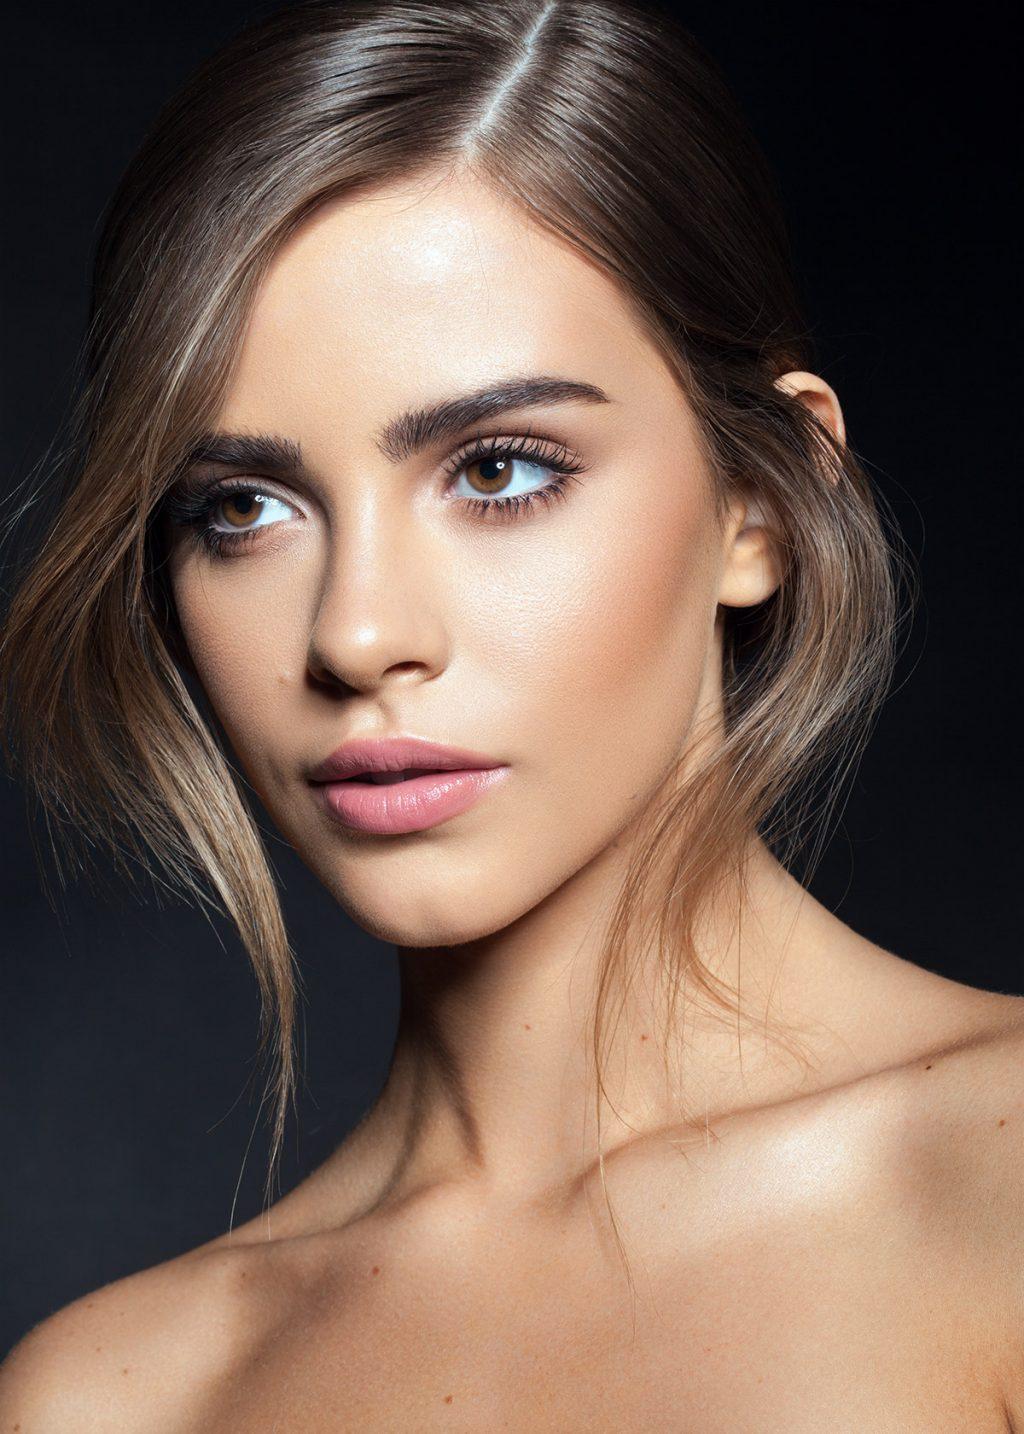 Click to enlarge. Model: Bridgetsatterlee of NOUS models + flawless makeup by Ernesto Casillas and hair by Raoul Alejandre photo & post by Julia Kuzmenko